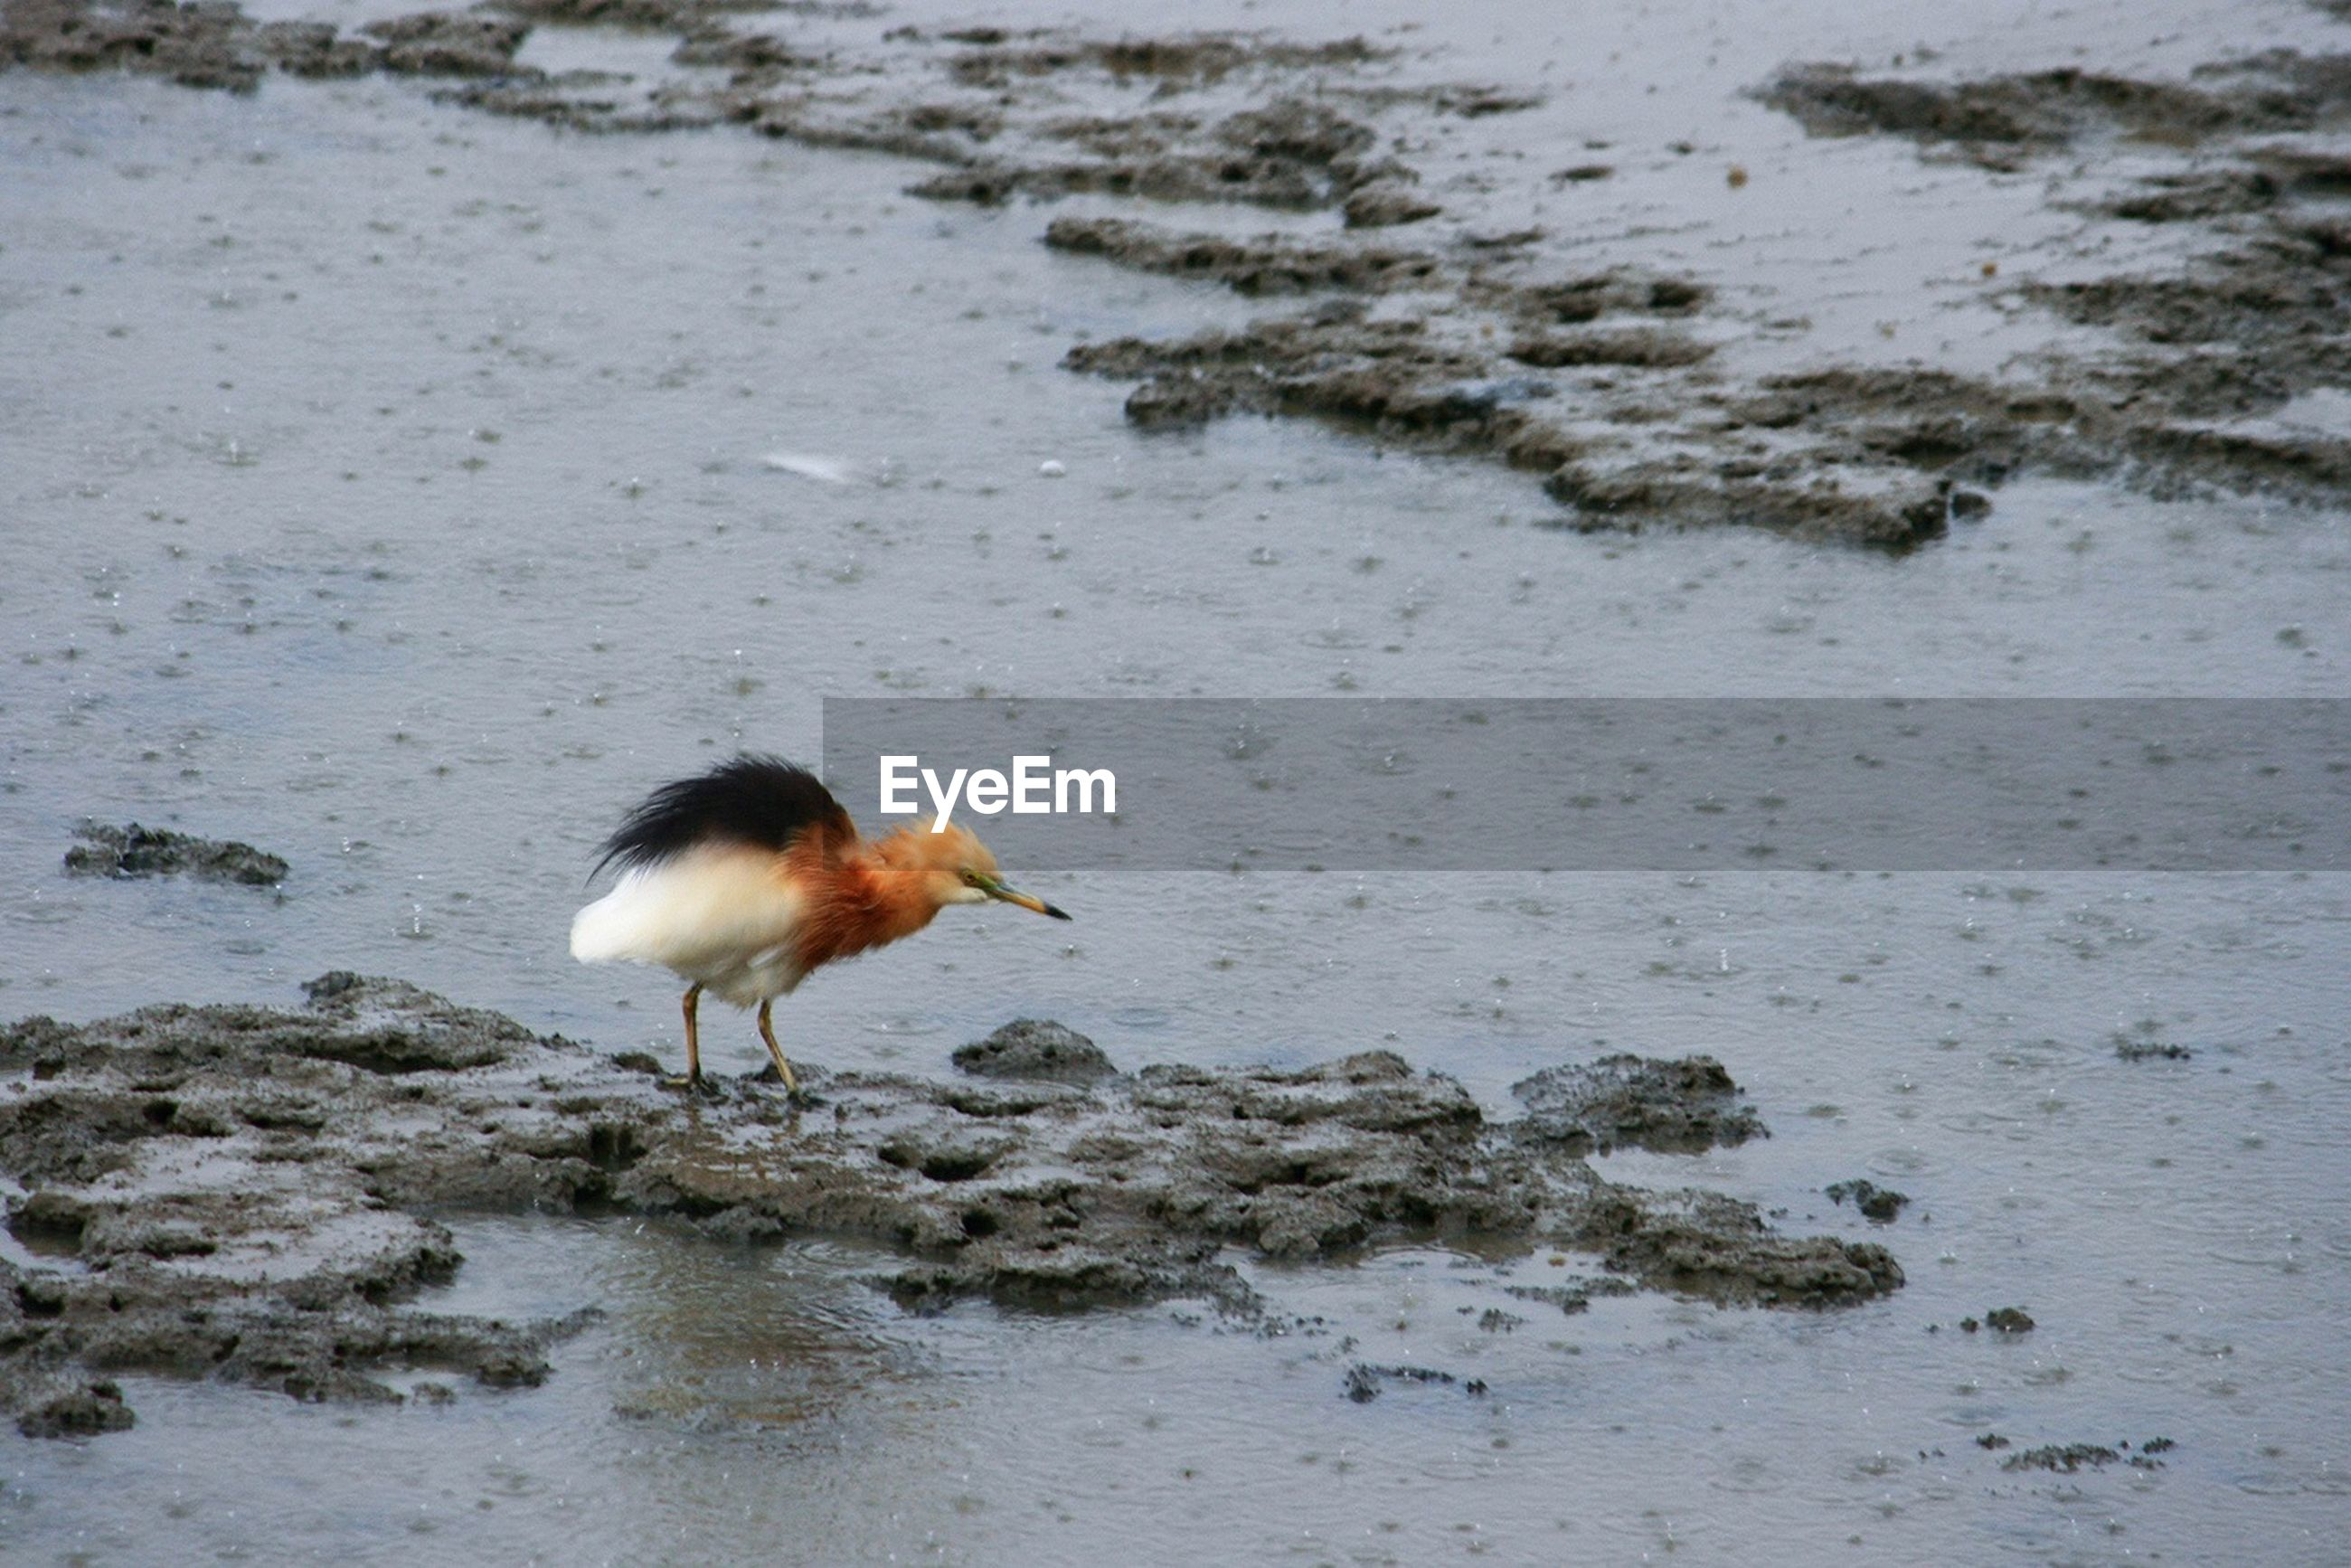 Bird on marshy land during rains